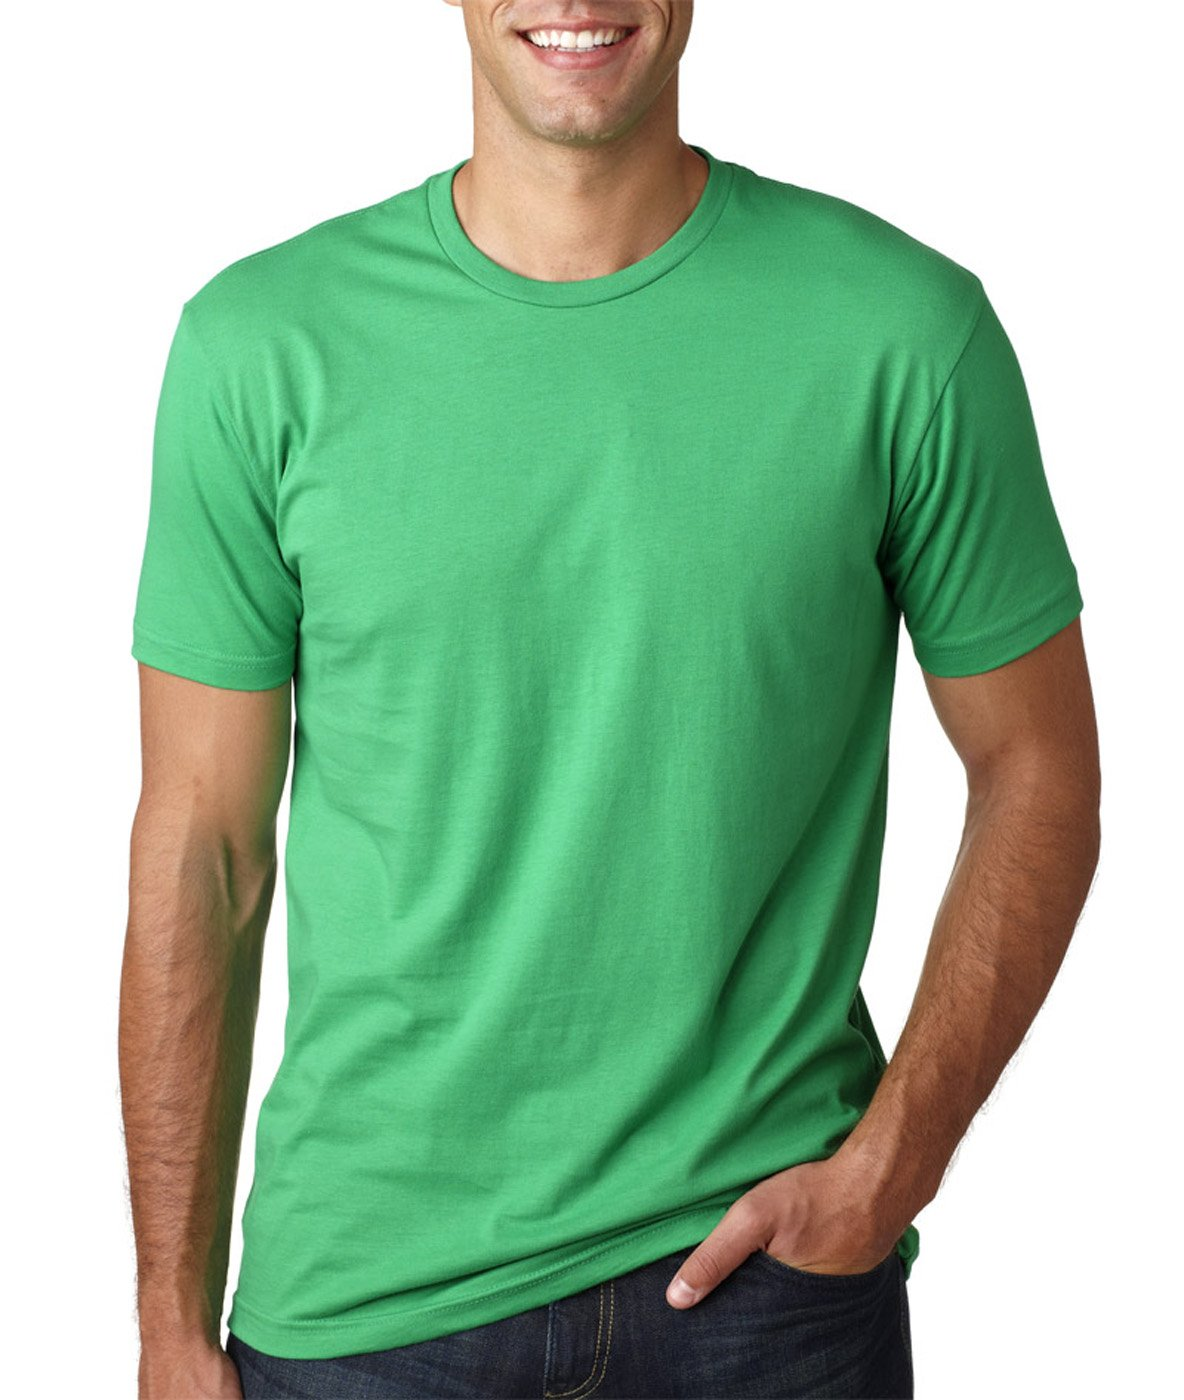 Next Level Mens Premium Fitted Short-Sleeve Crew T-Shirt 3600